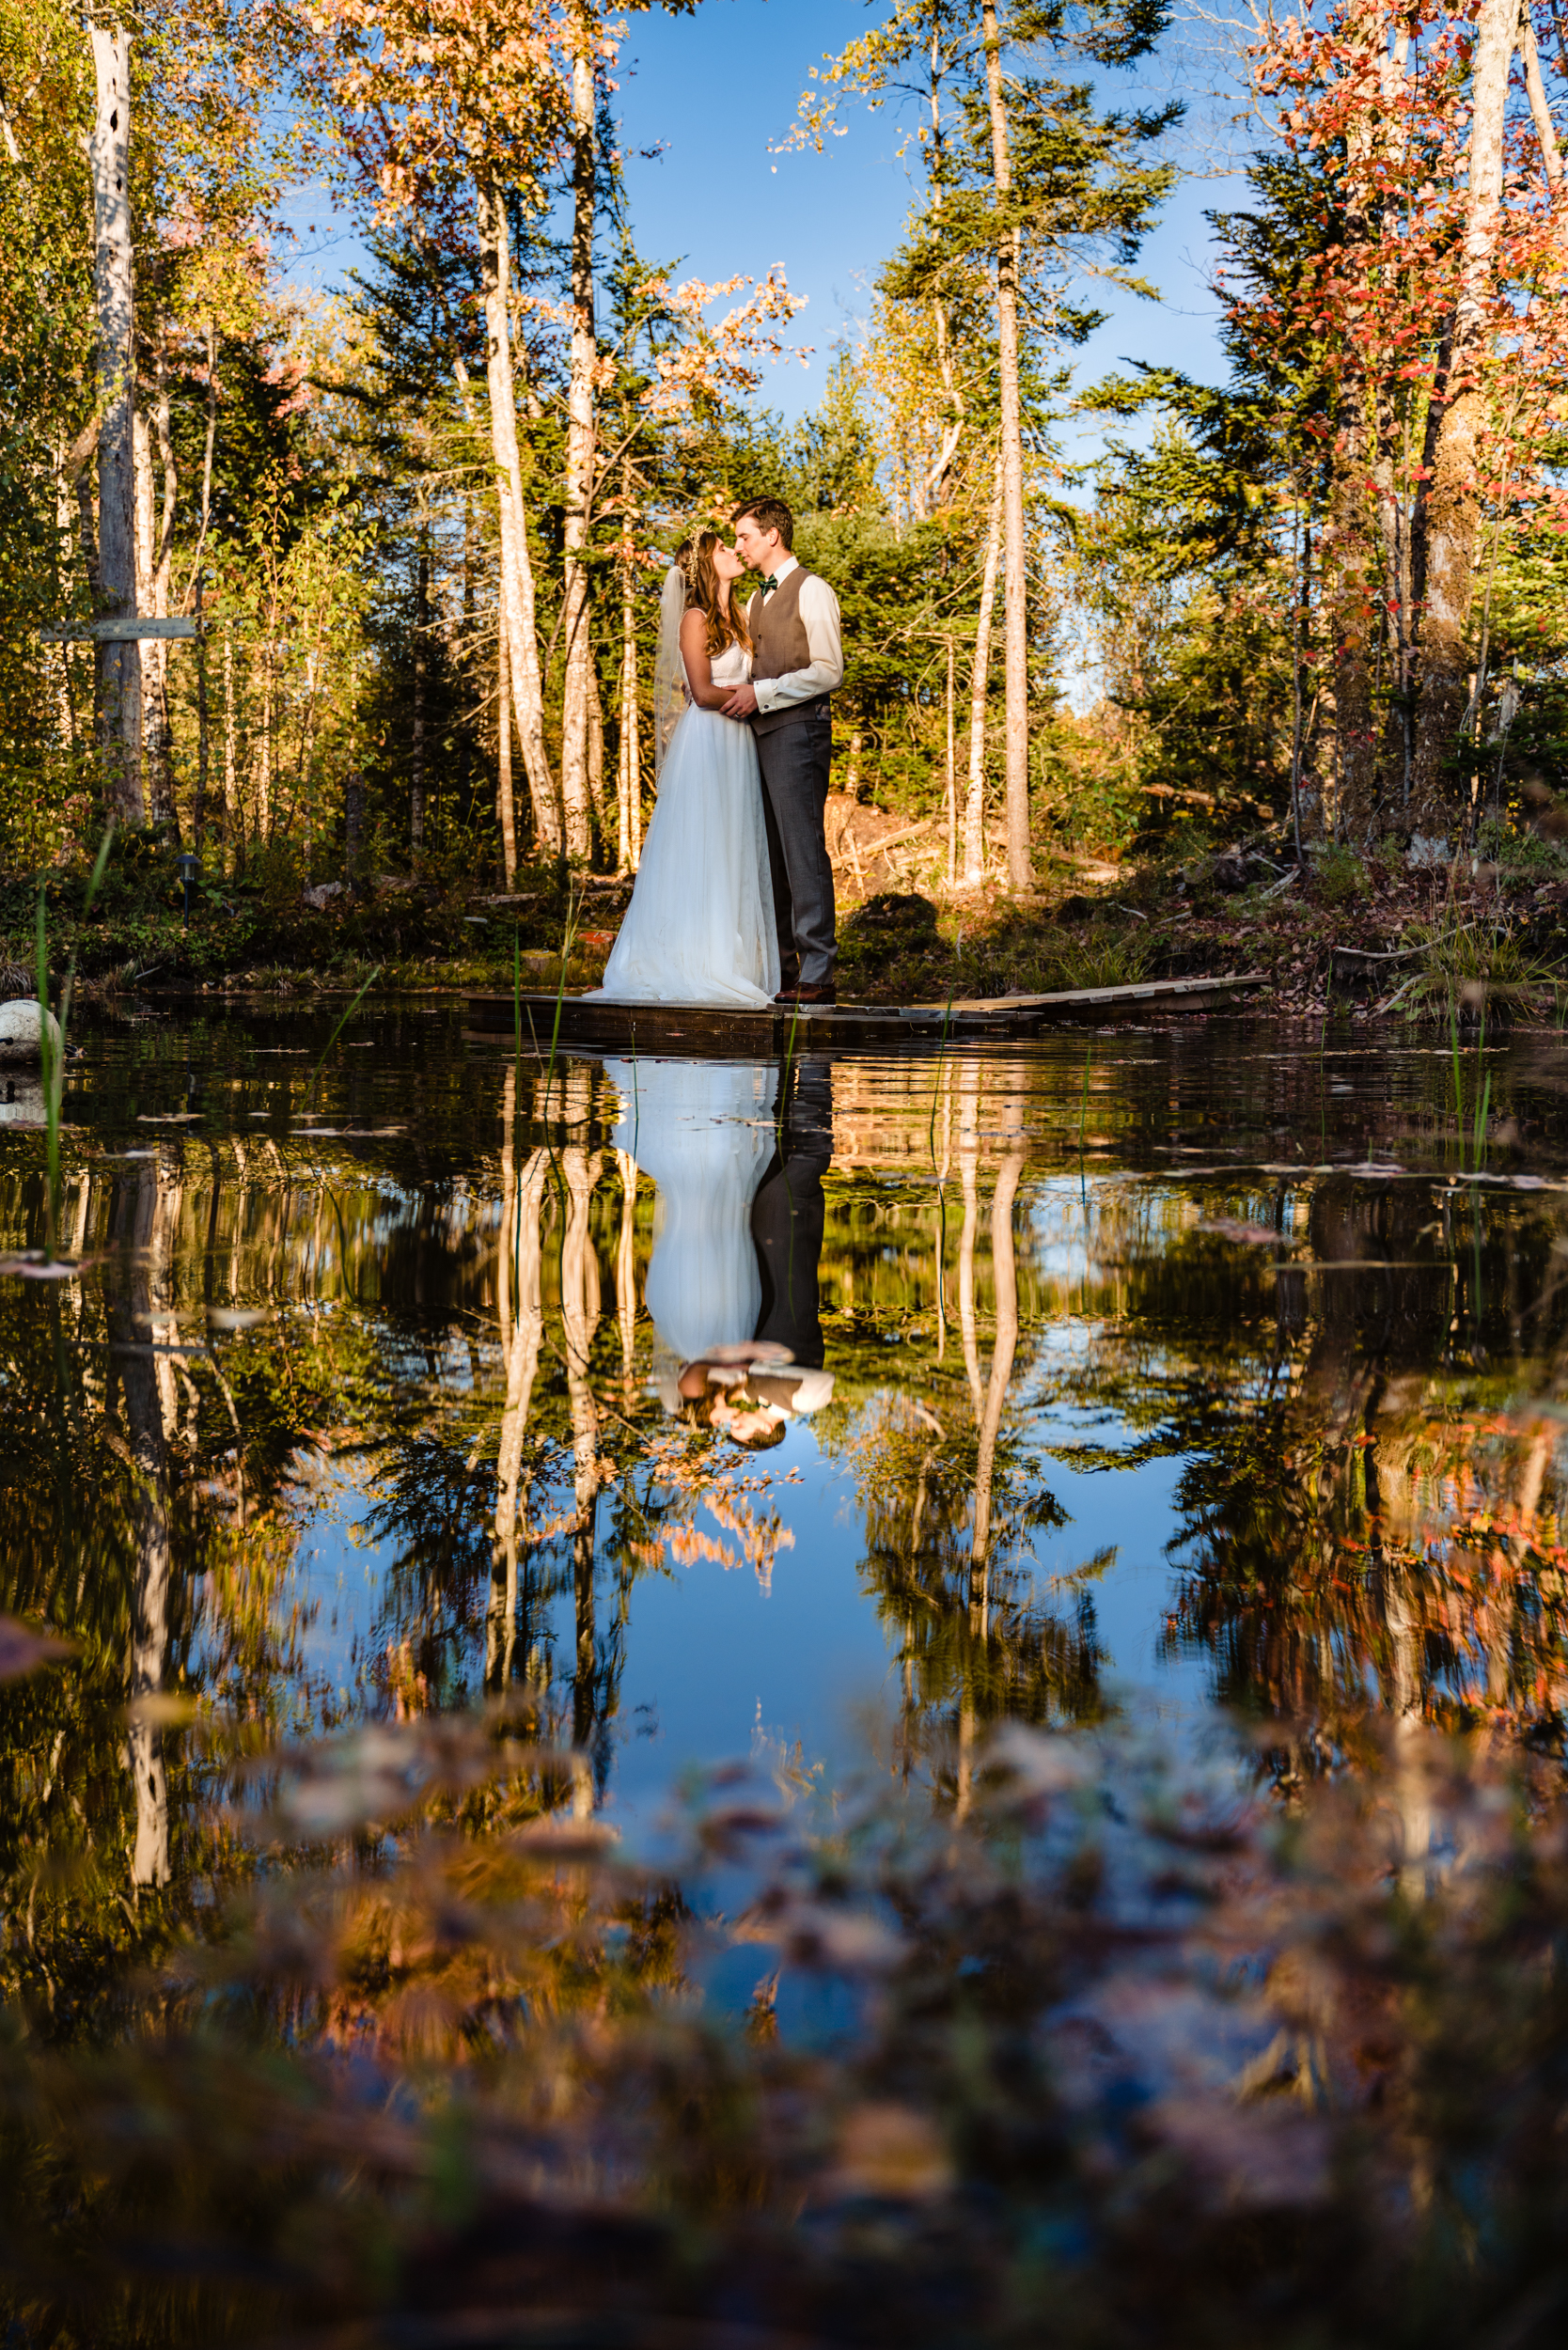 Halifax-wedding-photography-fall-photographers-novascotia-canada-ottawa (80 of 97).jpg